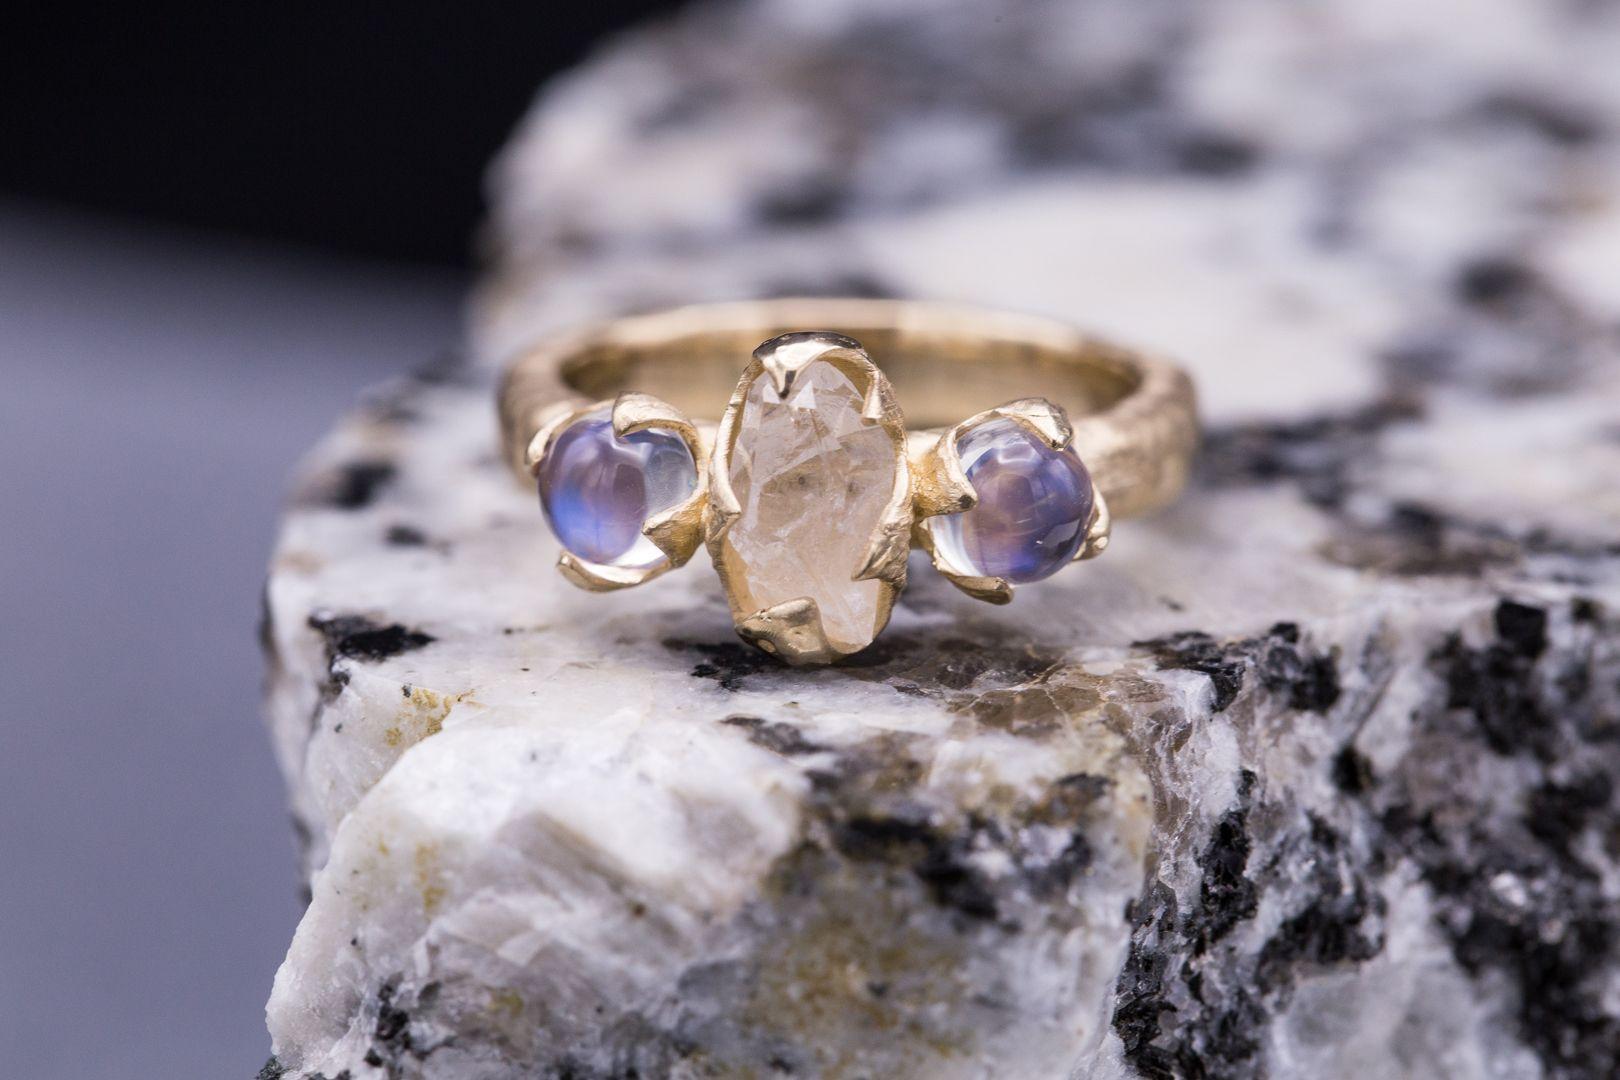 Raw Stone Jewelry Design and Care - International Gem Society